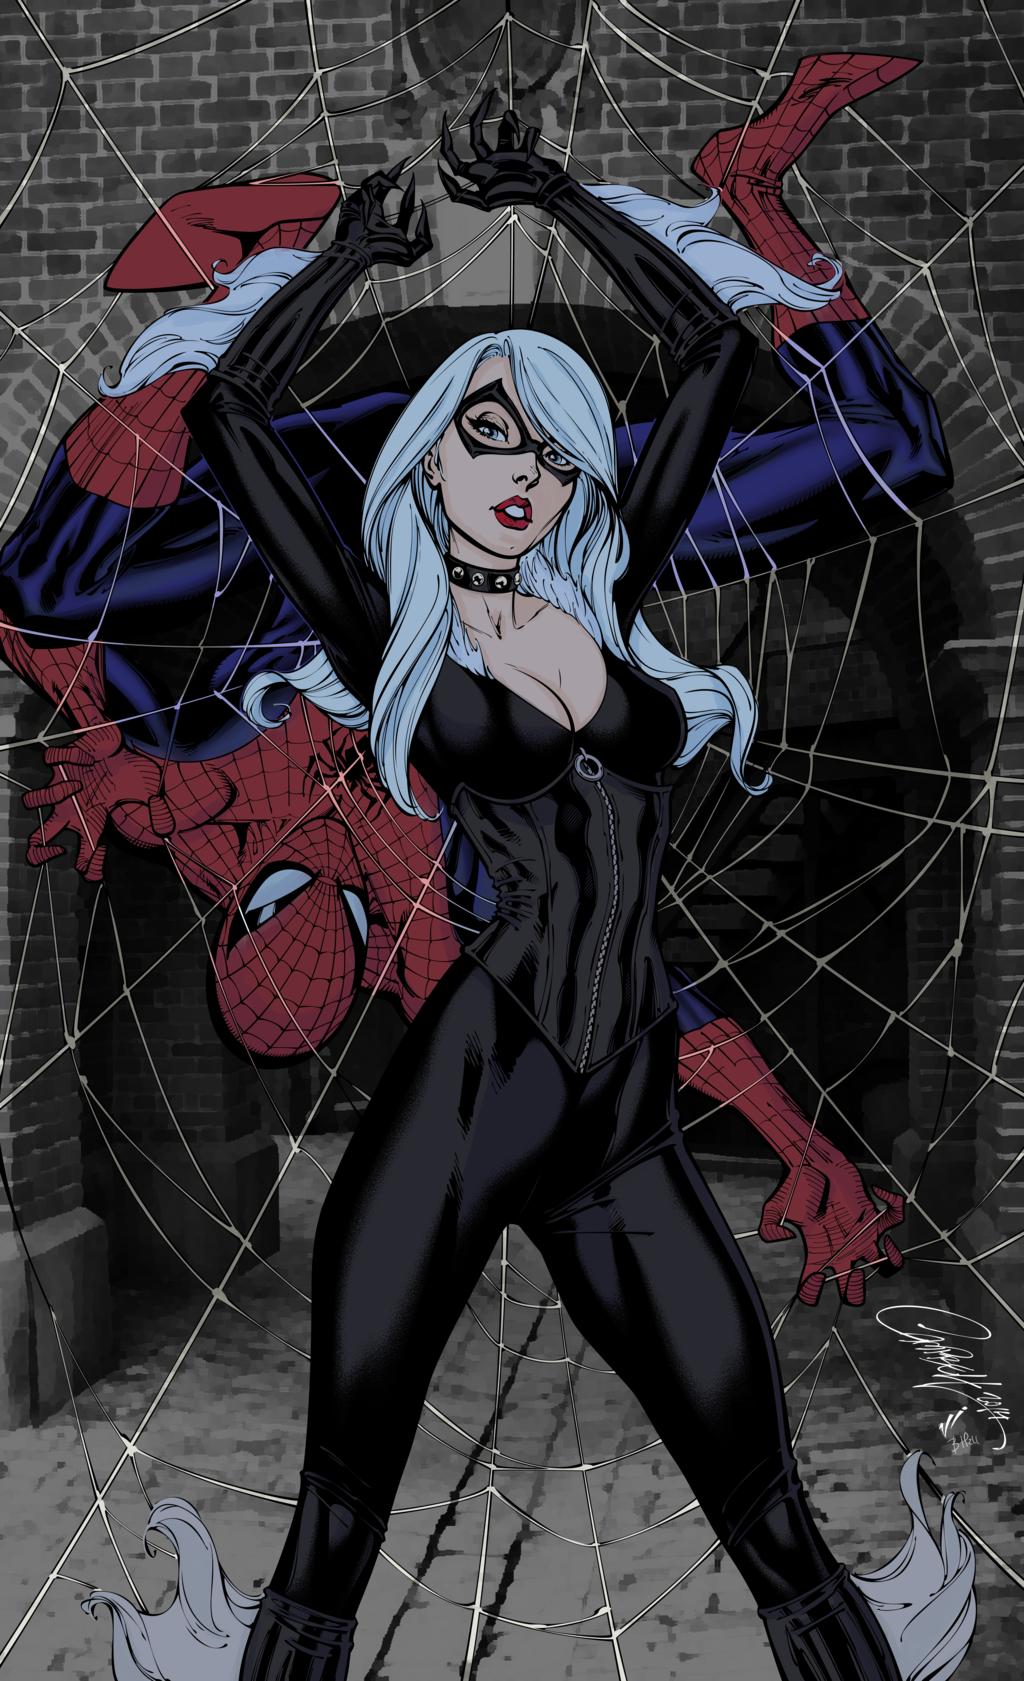 Spider Man And Black Cat J Scott Campbell Color Black Cat Marvel Spiderman Black Cat Comics Girls